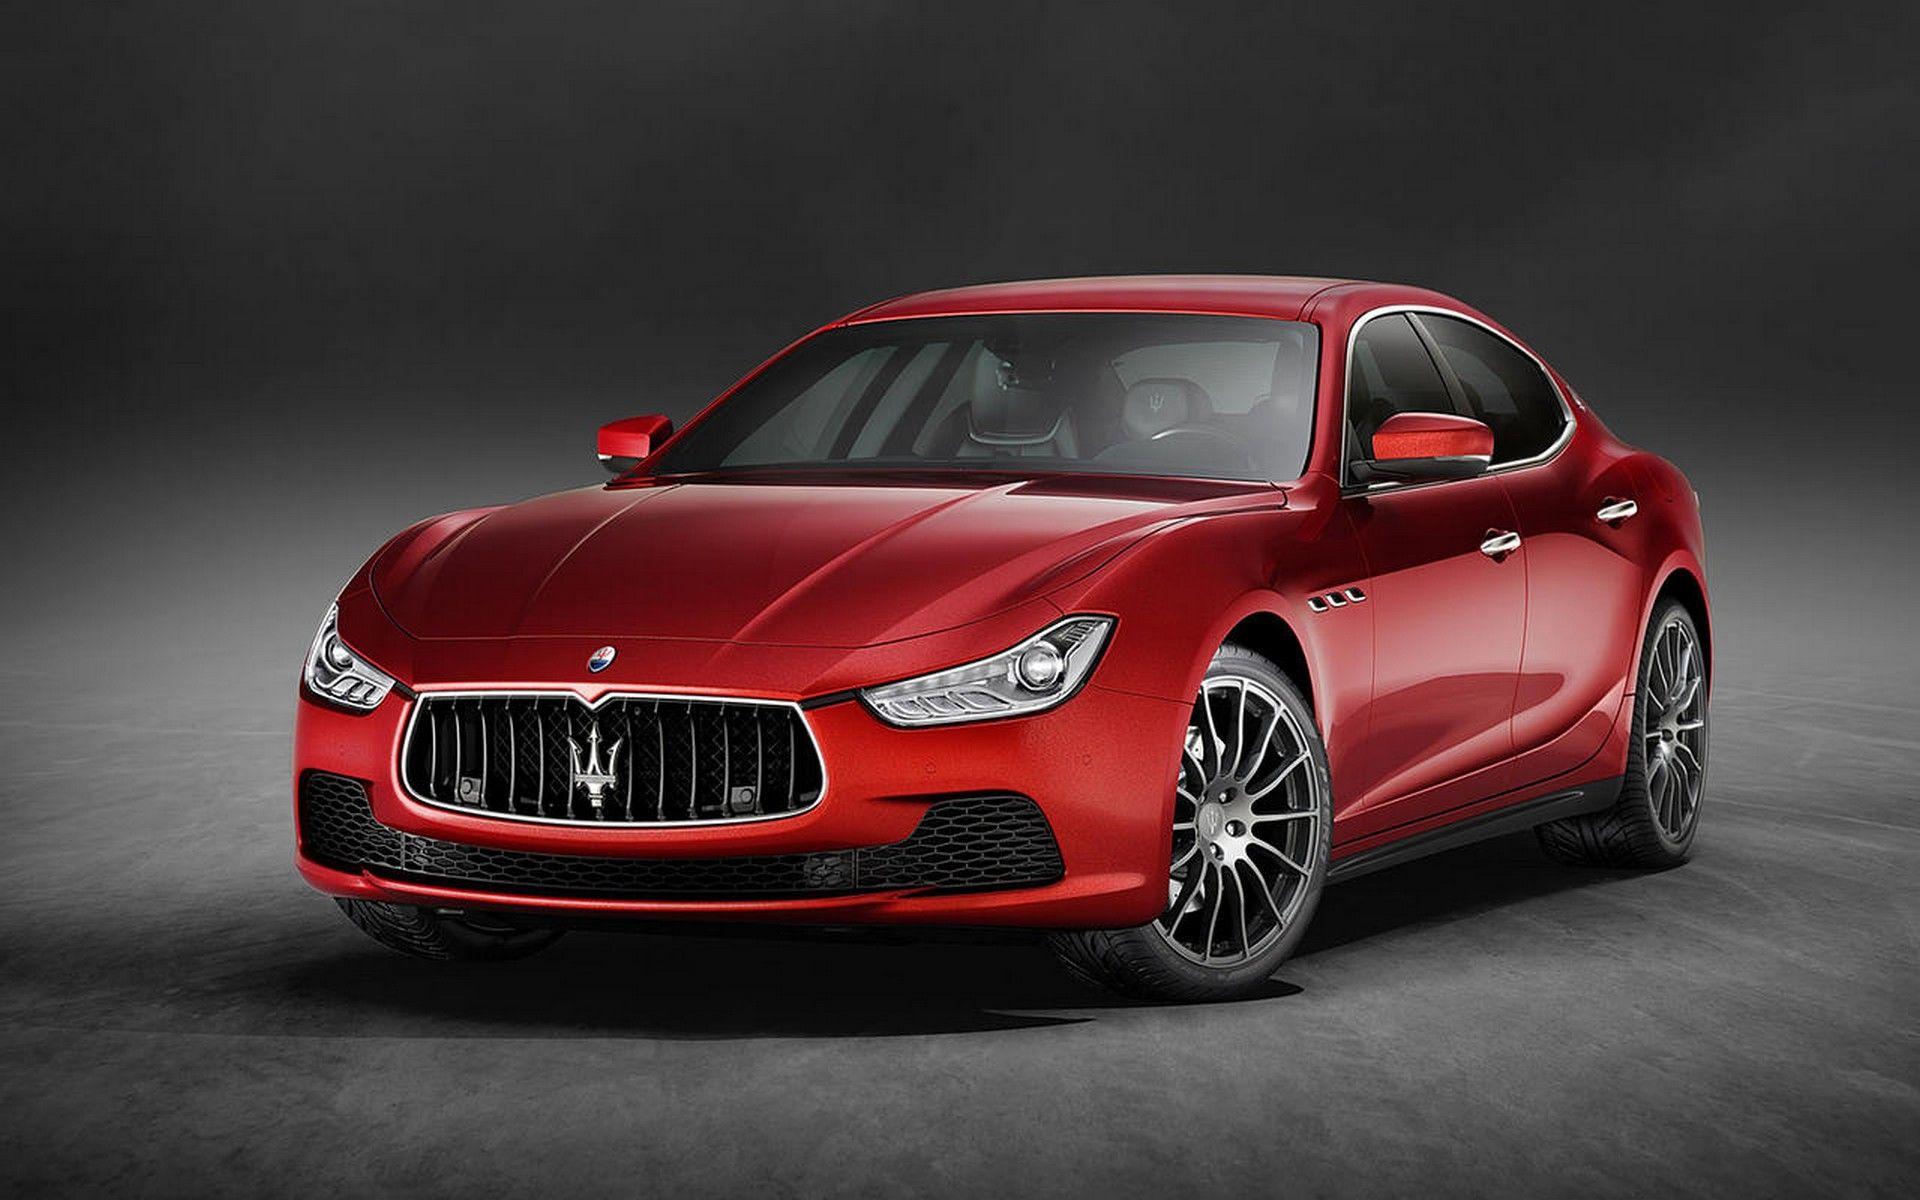 2019 Maserati Ghibli Review Price And Release Date 2019 Maserati